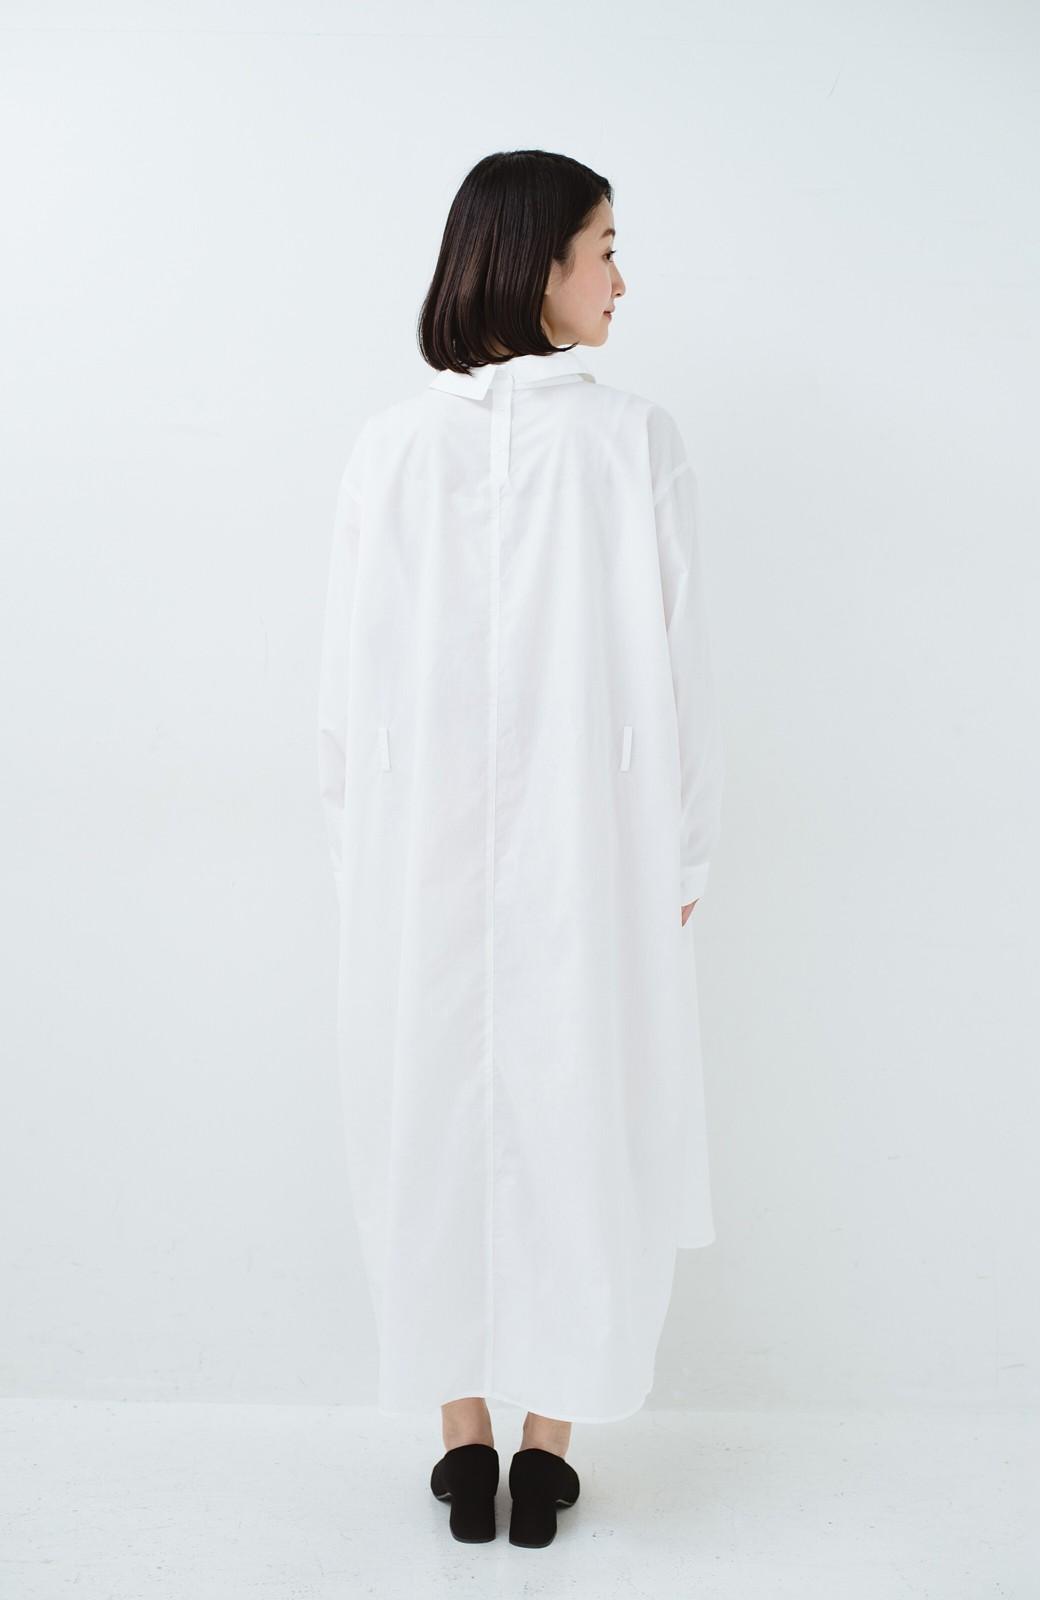 haco! 気持ちが凛と改まる リボン付きオーバーサイズシャツワンピース <ホワイト>の商品写真17